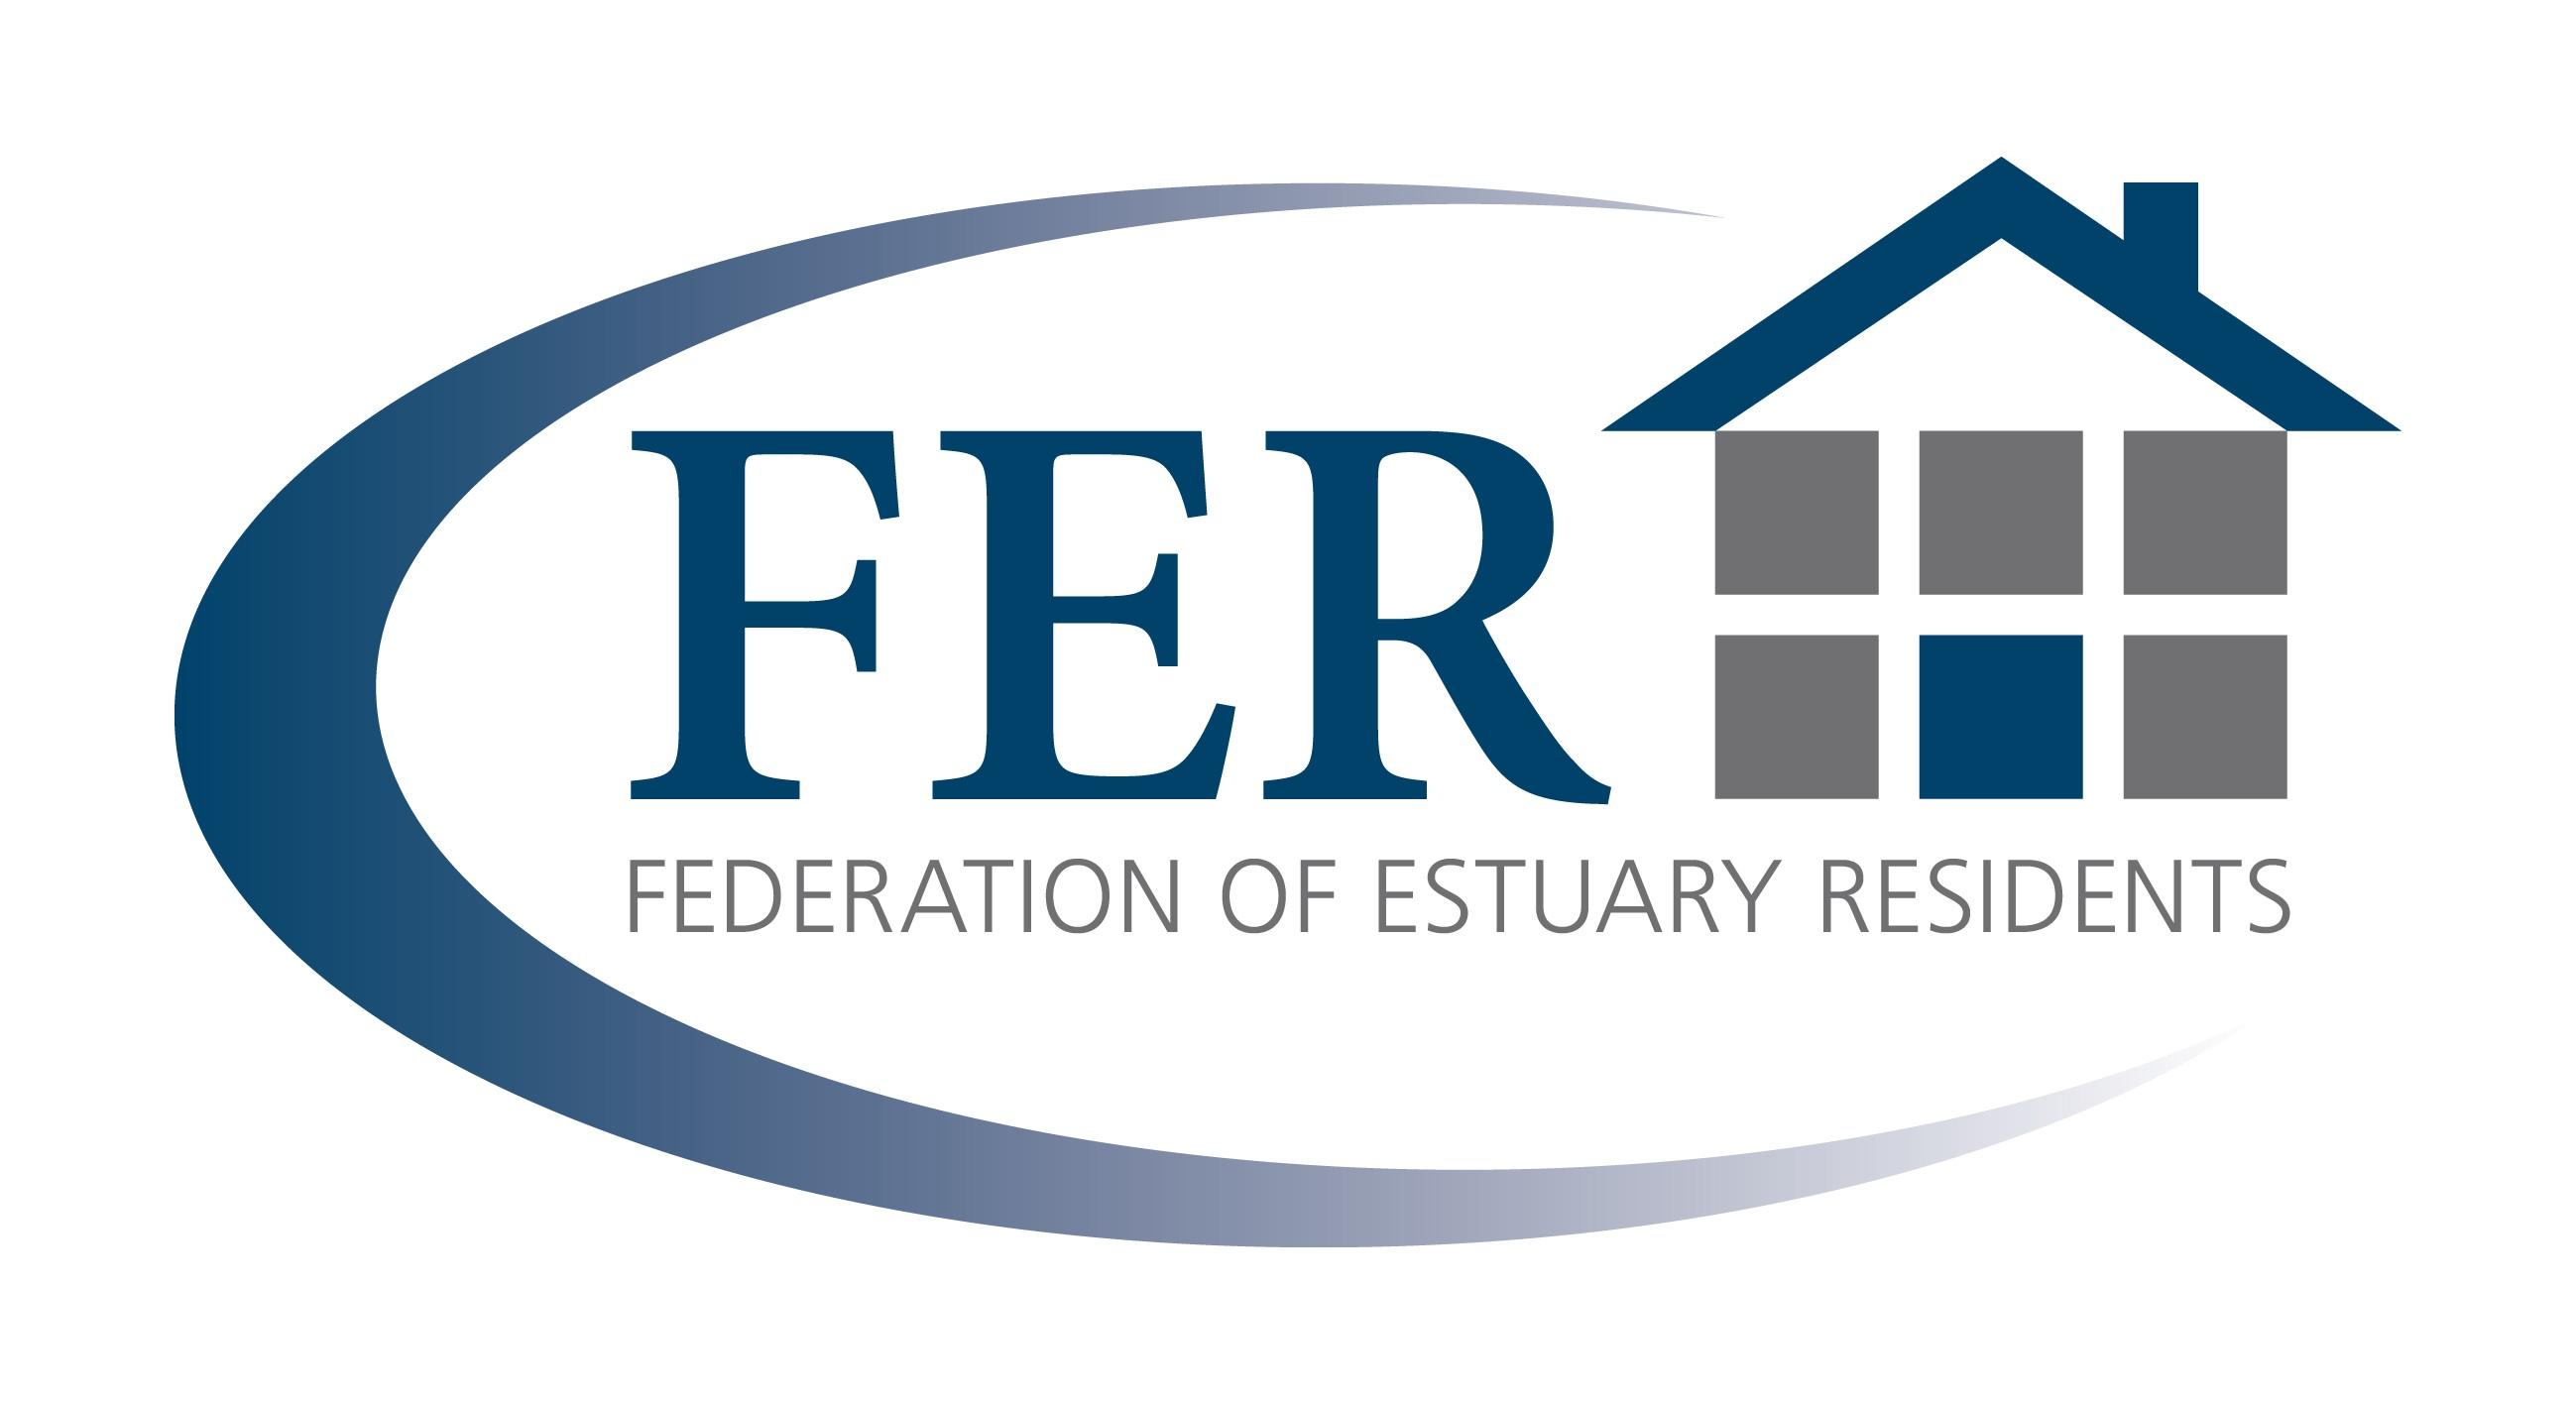 The Federation of Estuary Residents logo